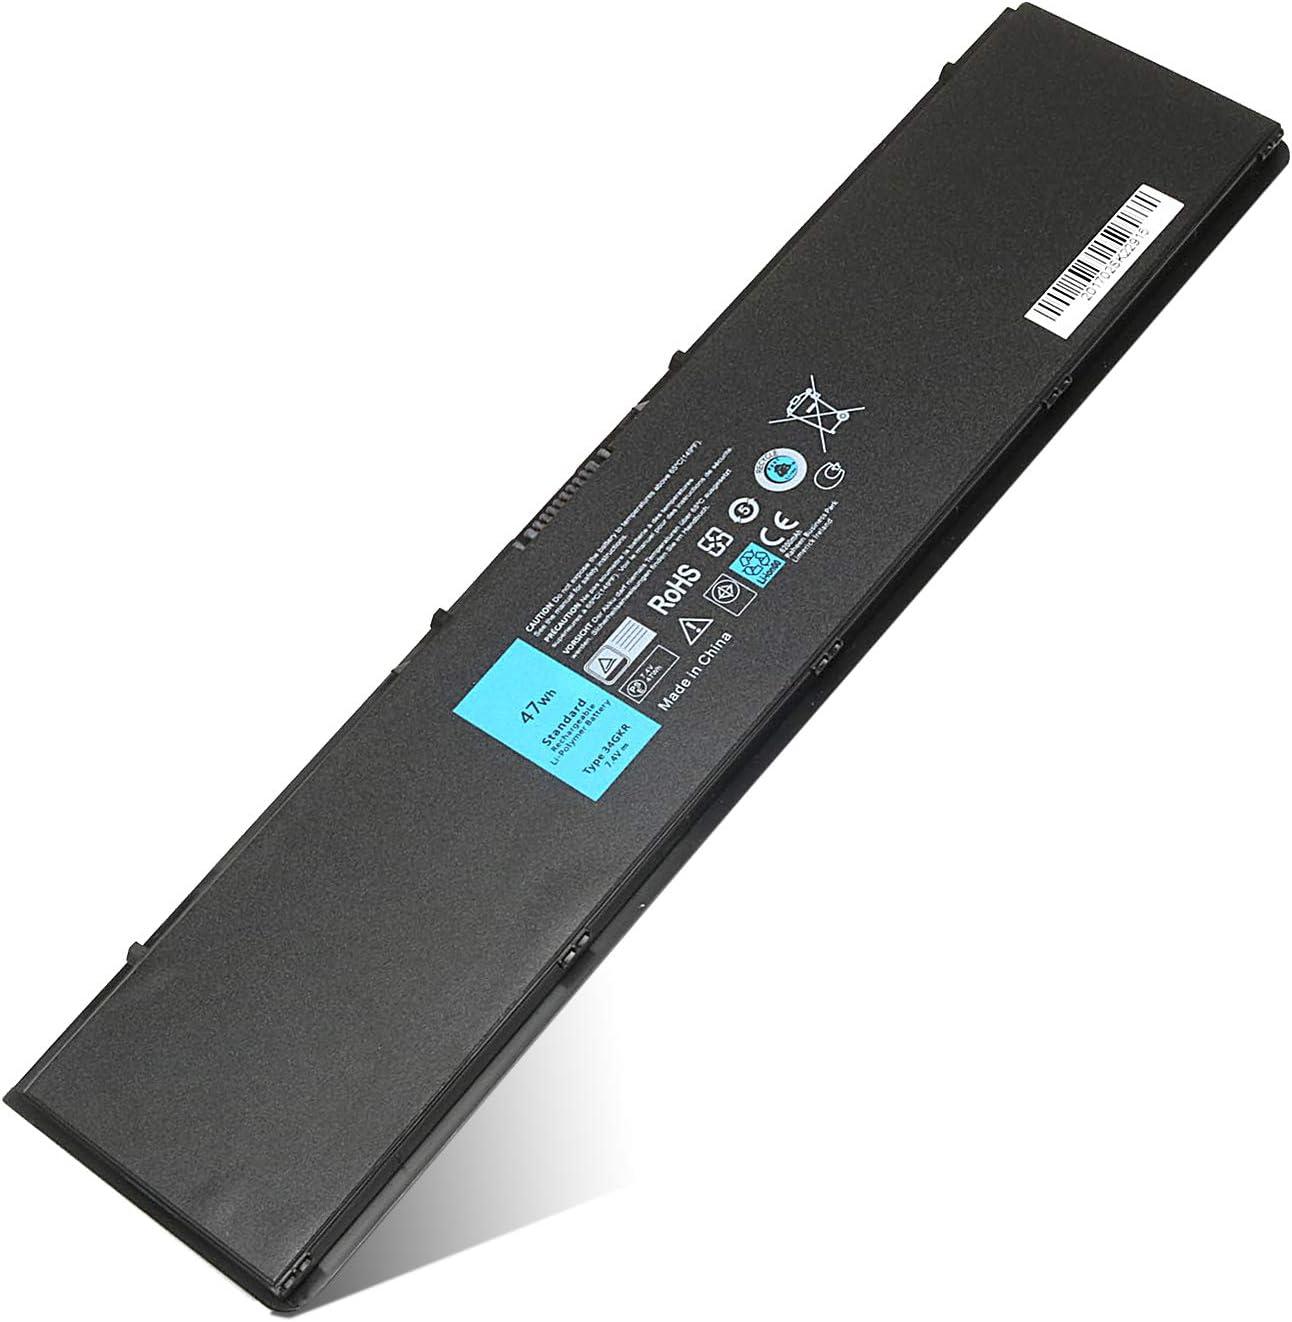 47Wh 7.4V New Replacement Laptop Battery for Dell Latitude E7440 E7450 E7420 Battery fit 451-BBFV 3RNFD G0G2M PFXCR T19VW 34GKR 0909H5 0G95J5 E225846 Notebook Battery